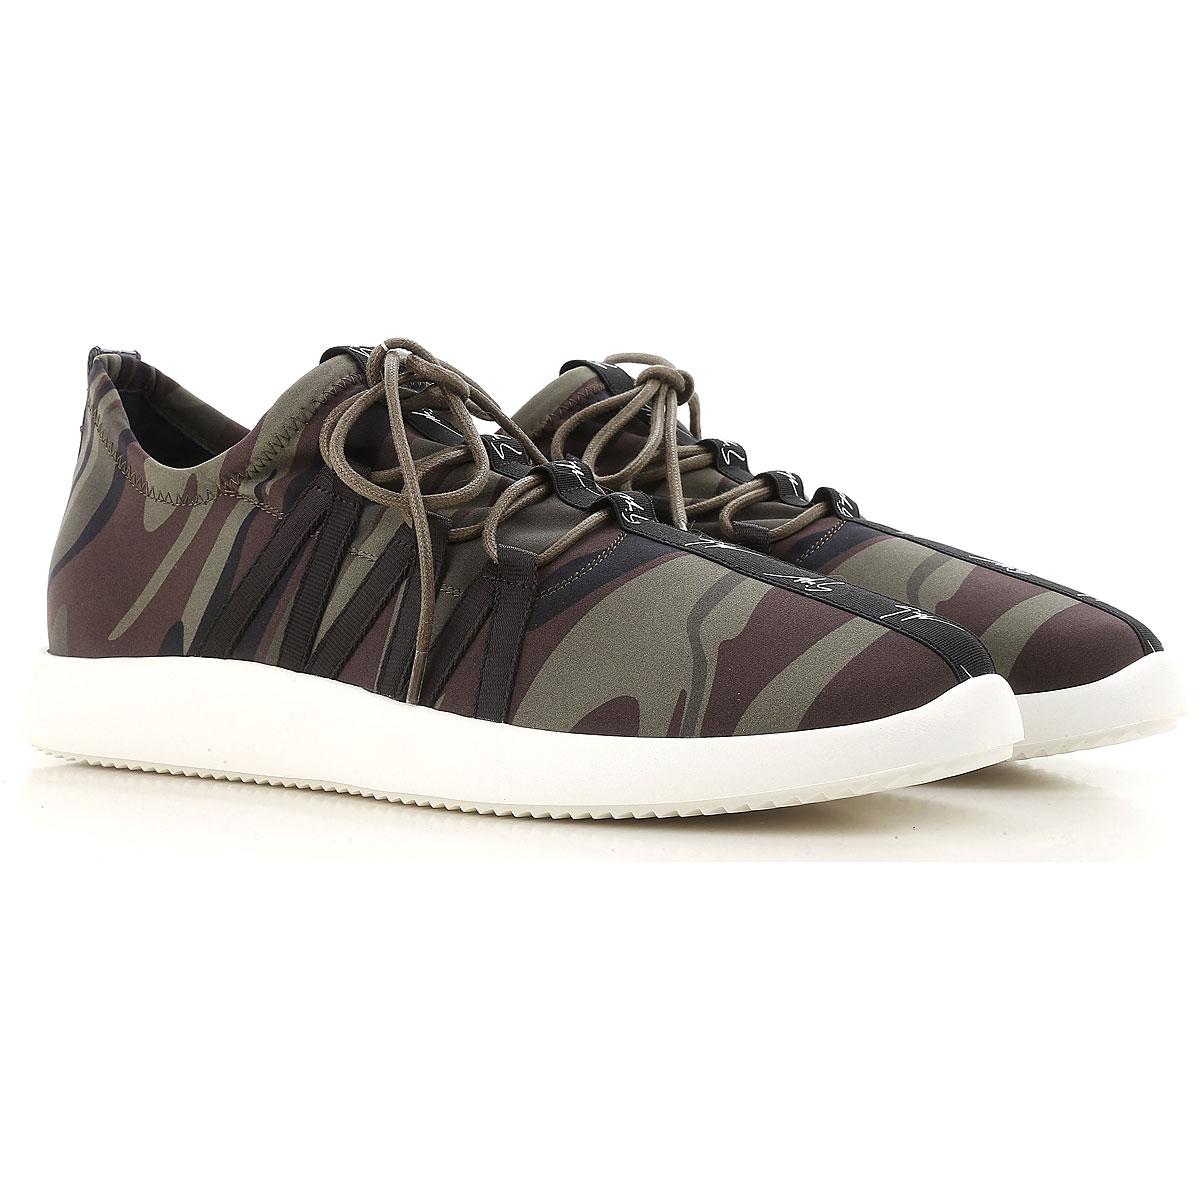 Giuseppe Zanotti Design Sneakers for Men On Sale in Outlet, Camouflage Green, Neoprene, 2019, 7.5 8